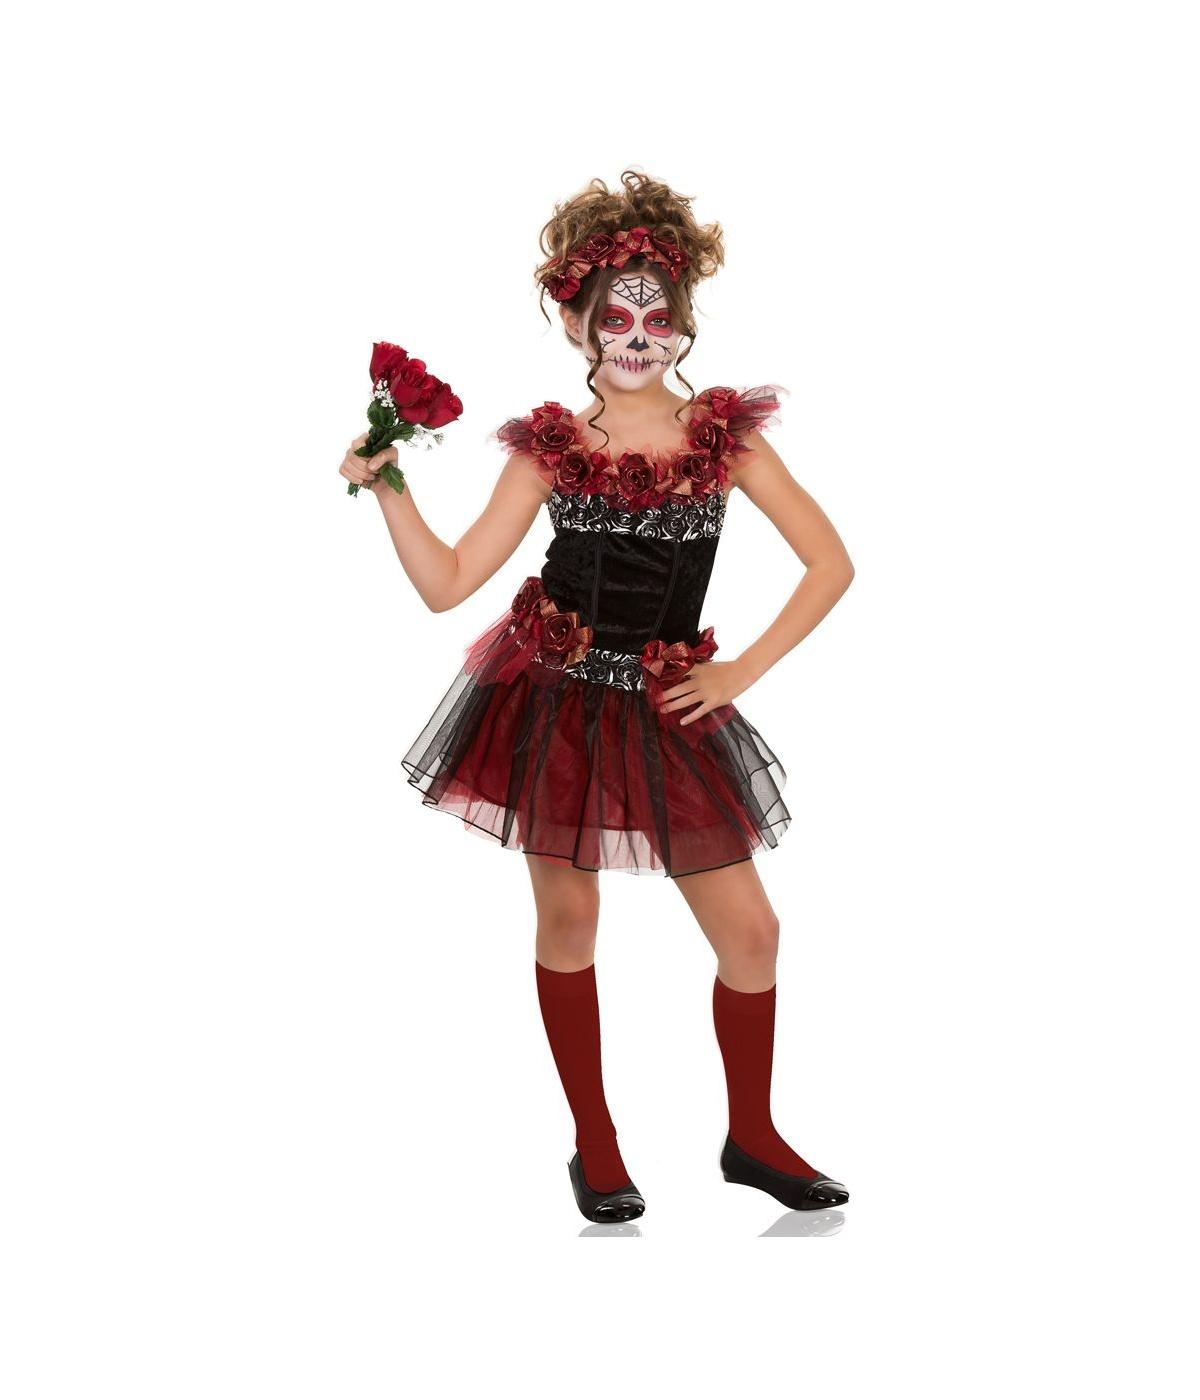 cda025183fa Day of the Dead Sugar Skull Girls Costume - International Costumes